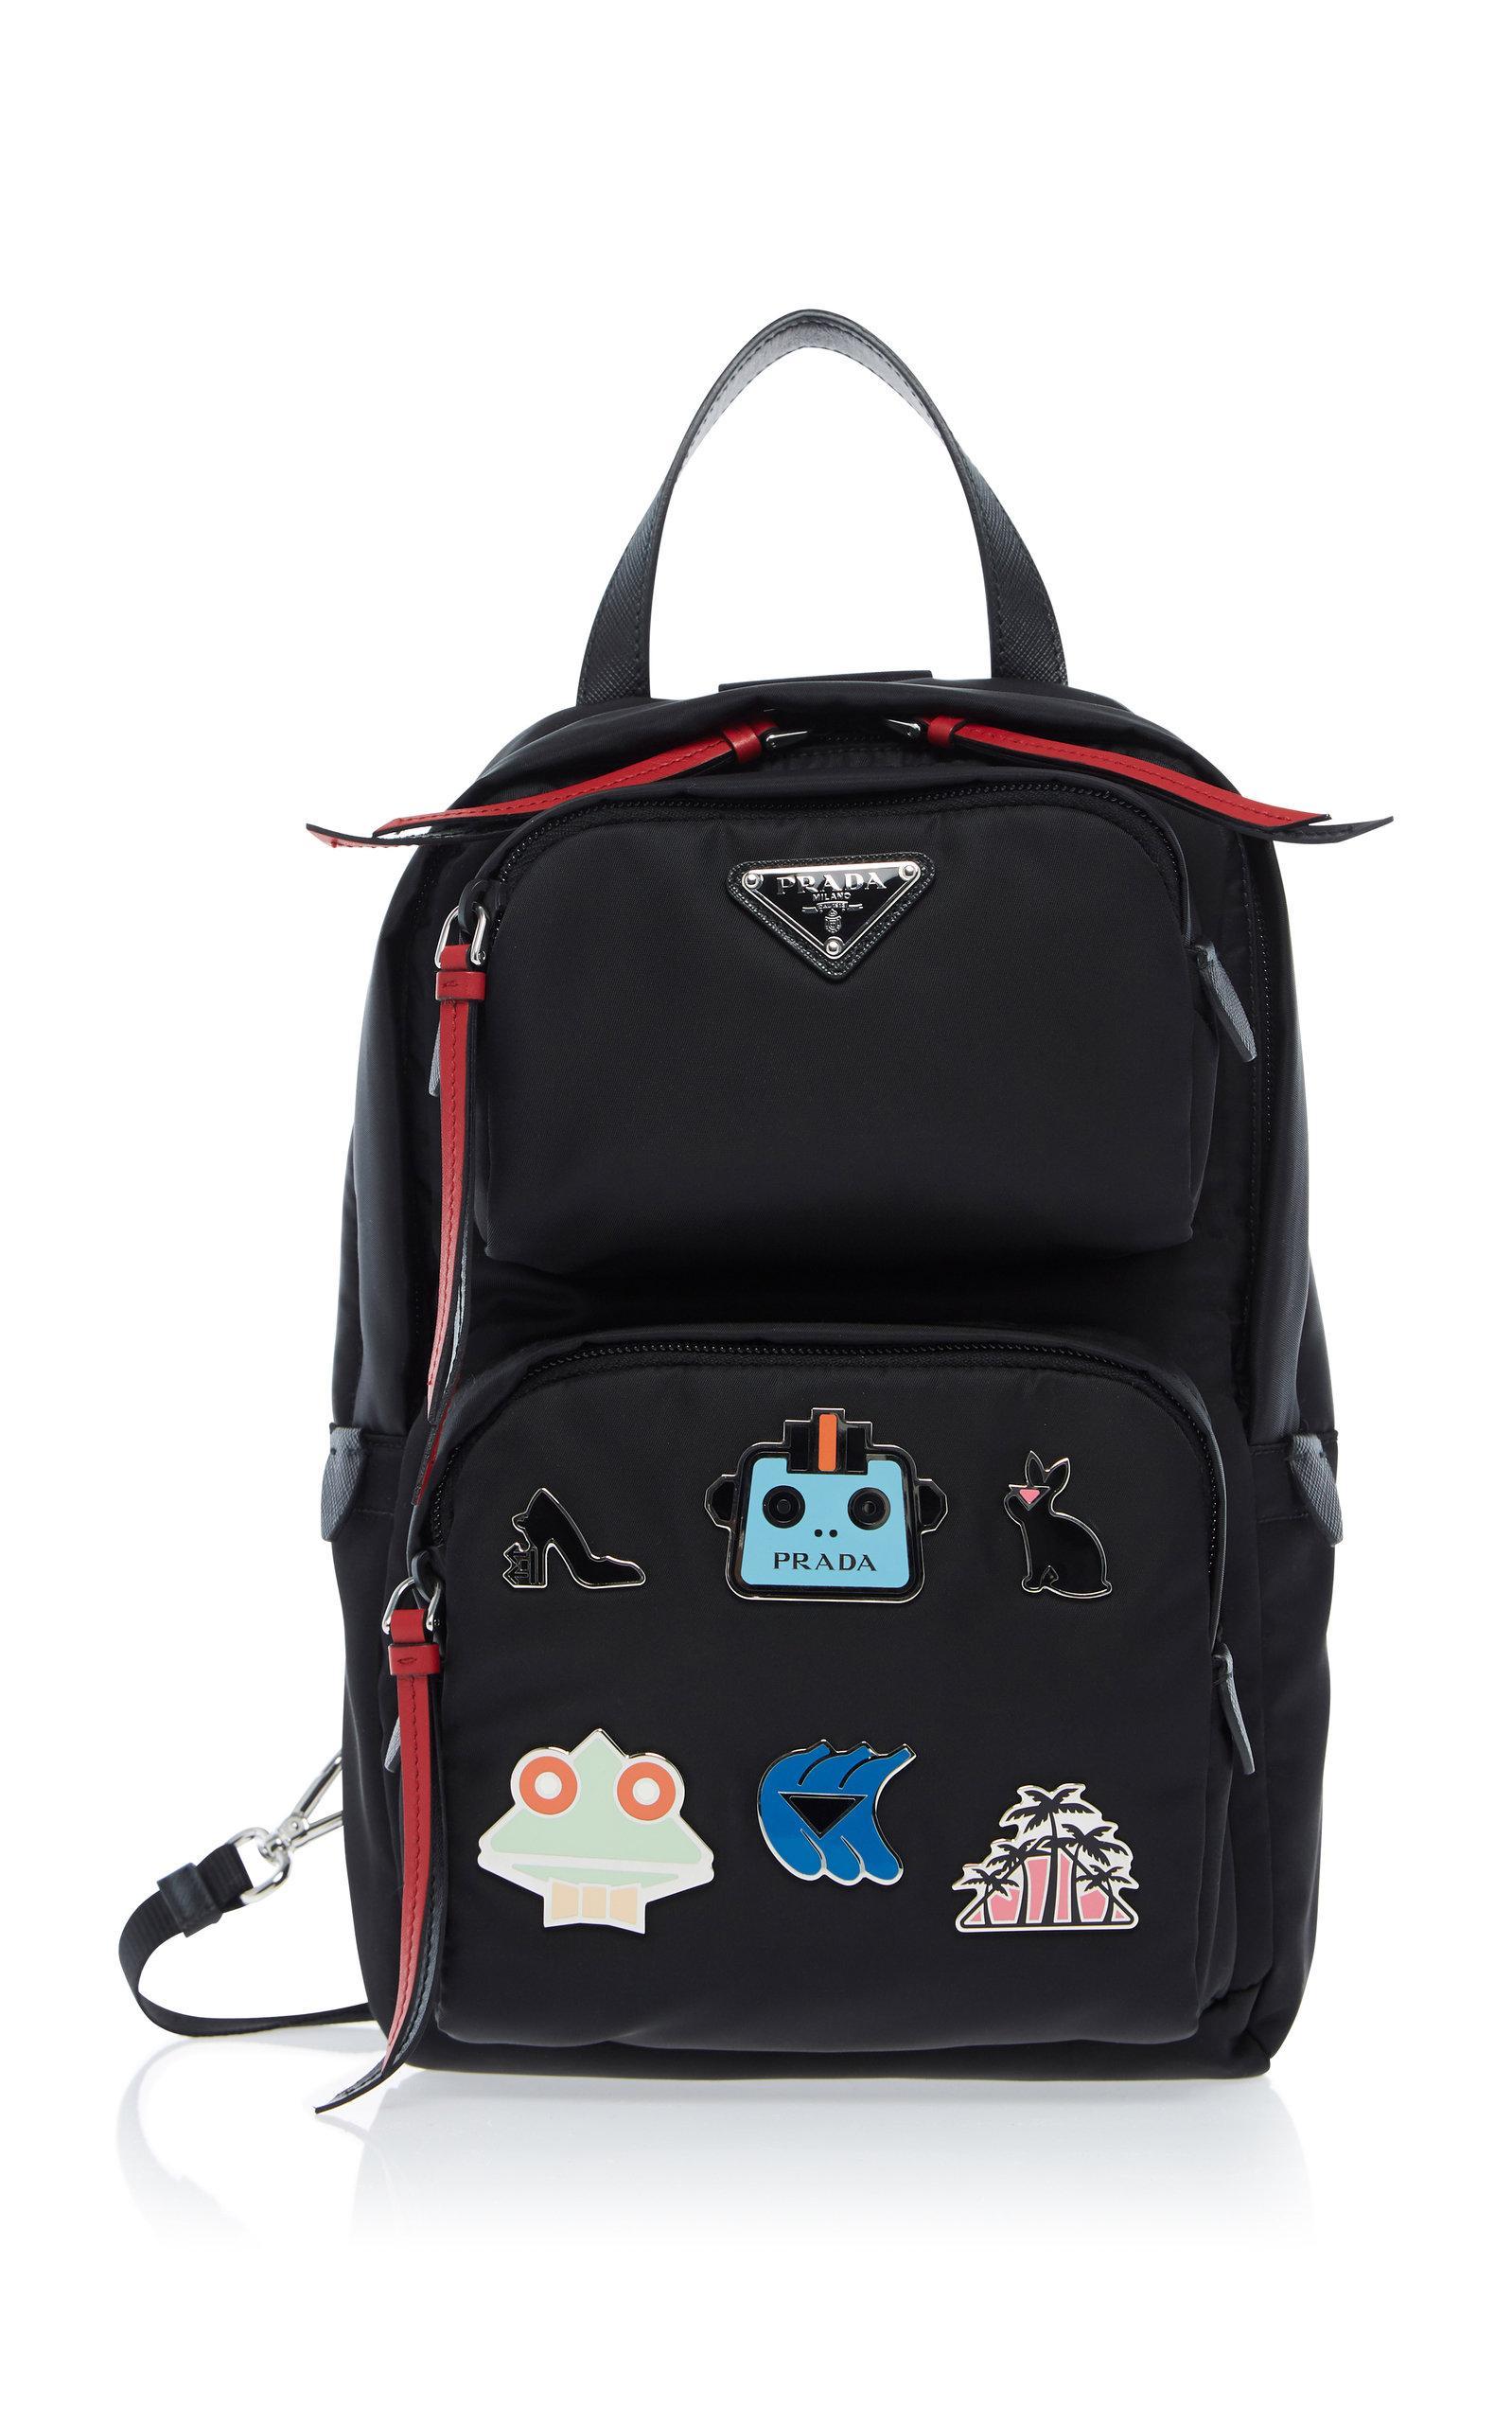 416fd5c3d56e Prada Small AppliquÉD Shell Backpack In Black